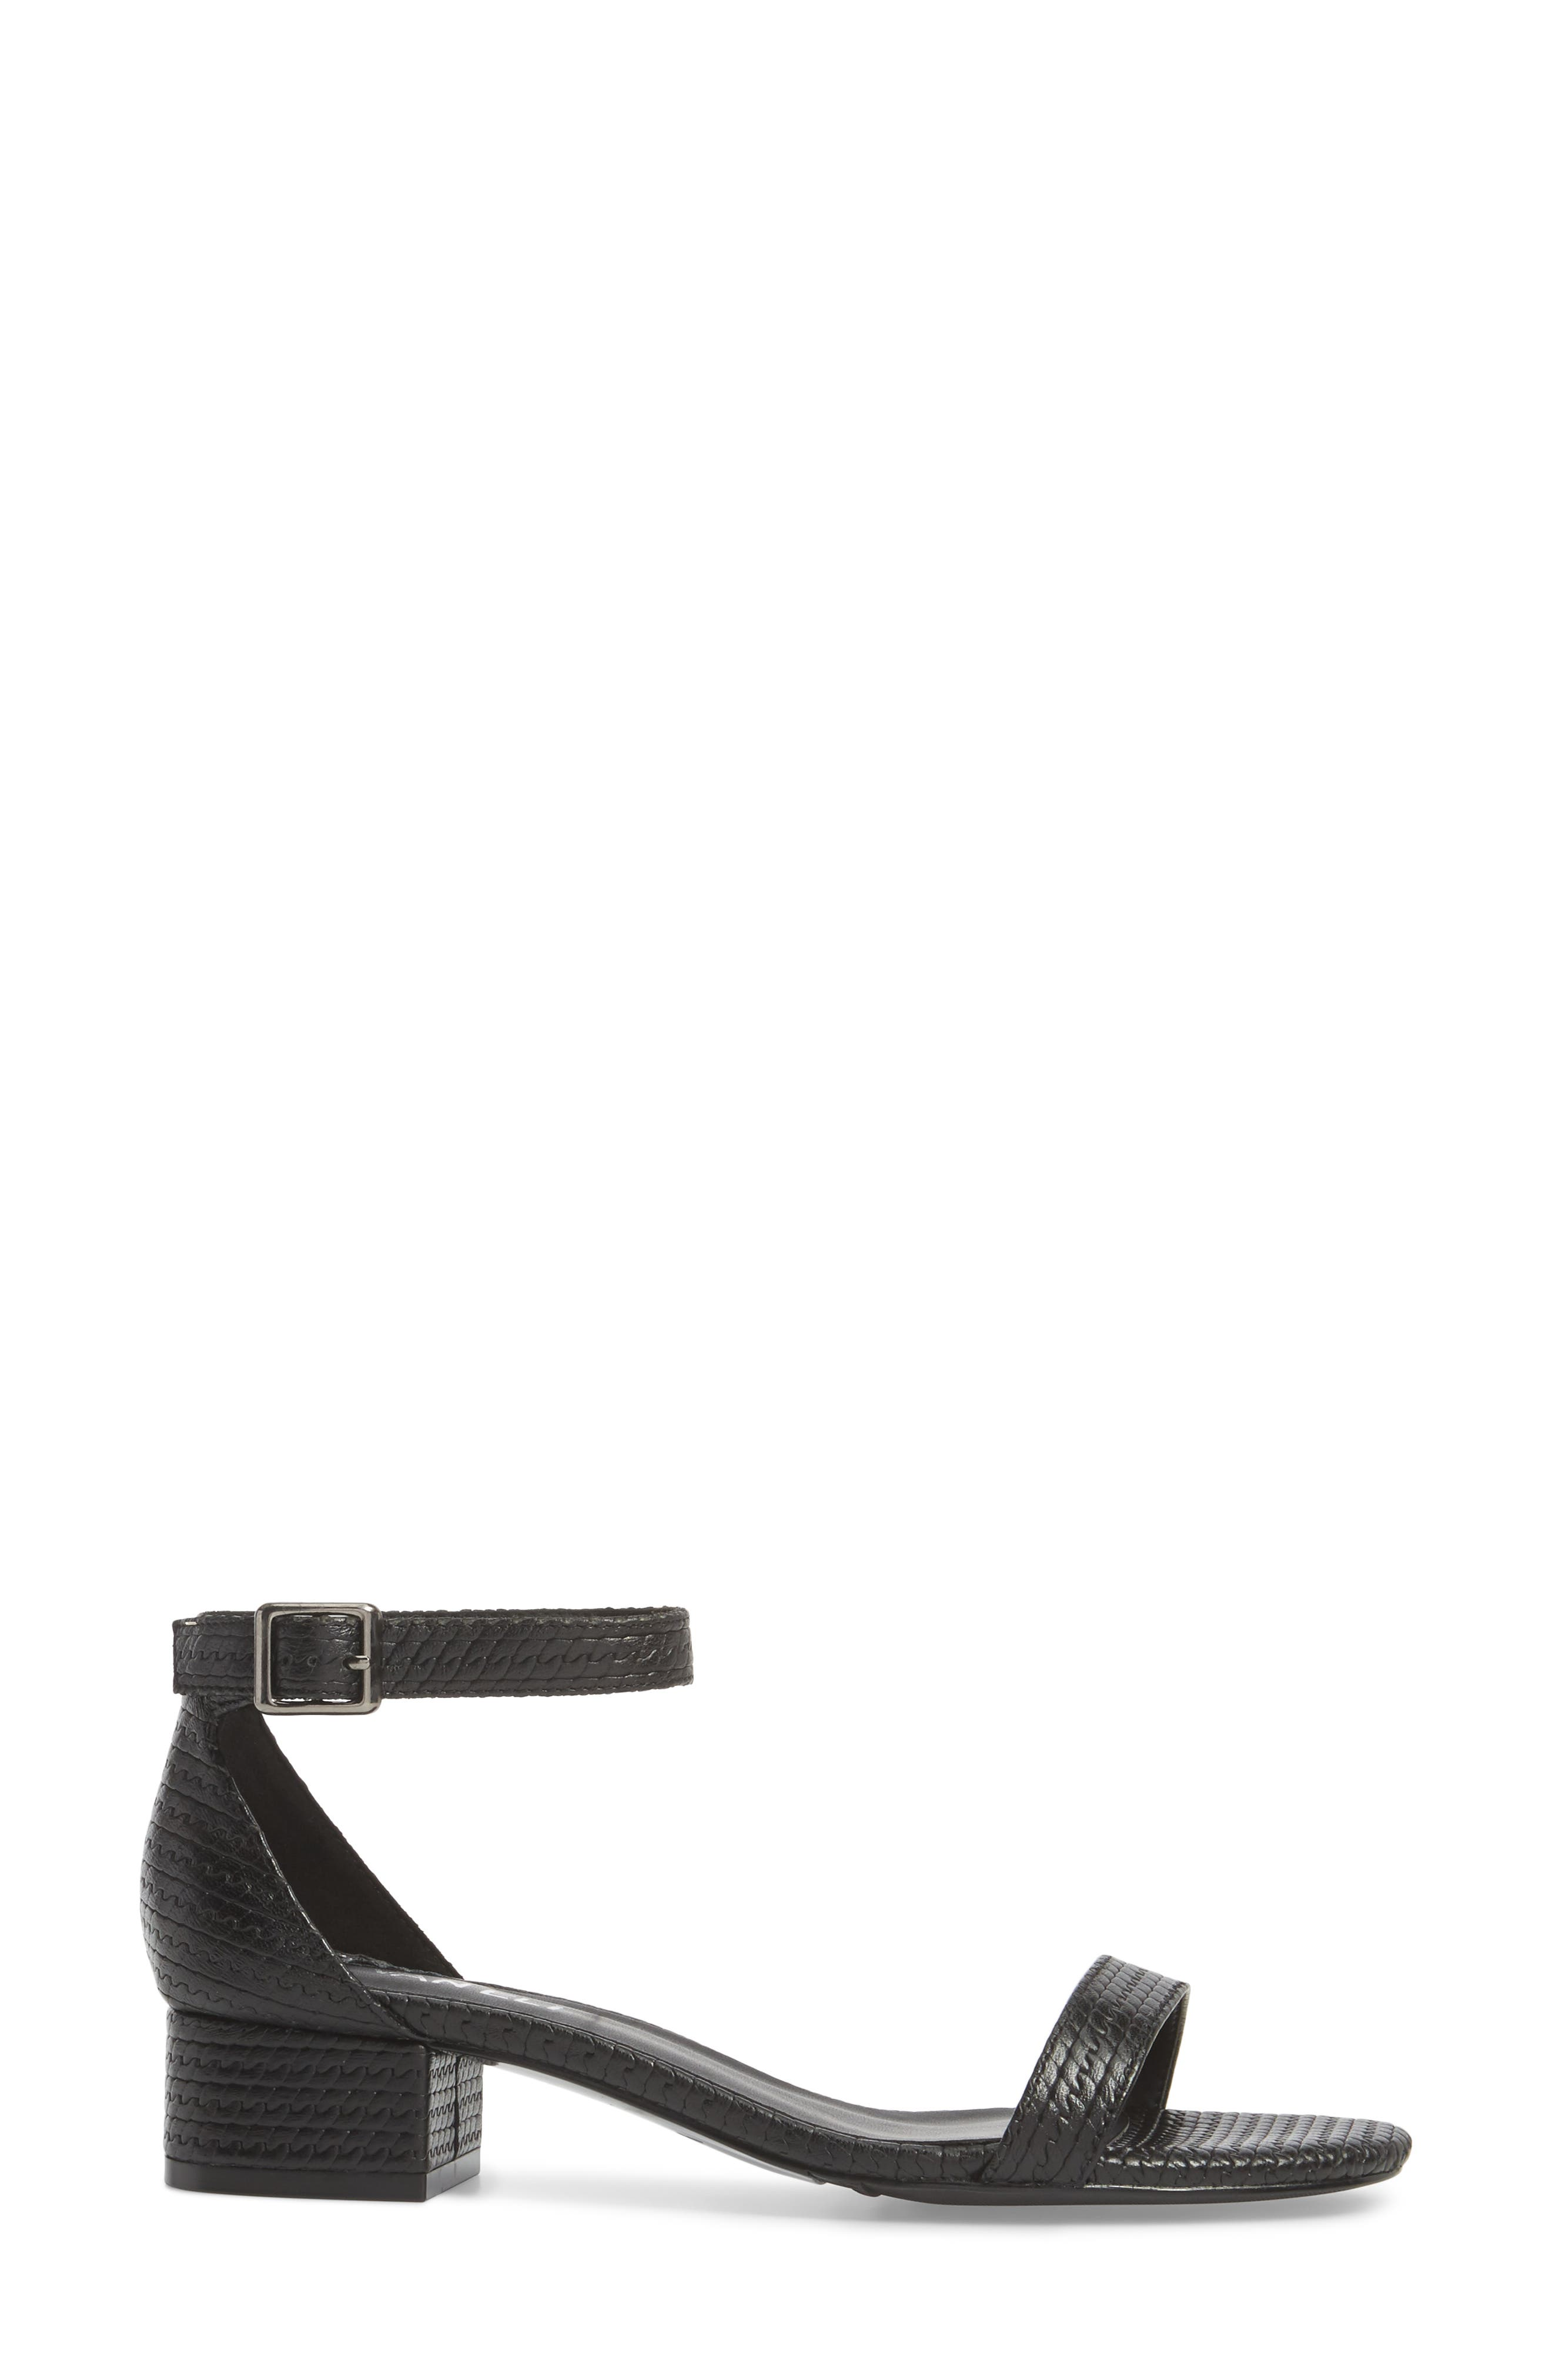 Hirin Sandal,                             Alternate thumbnail 3, color,                             Black Printed Leather